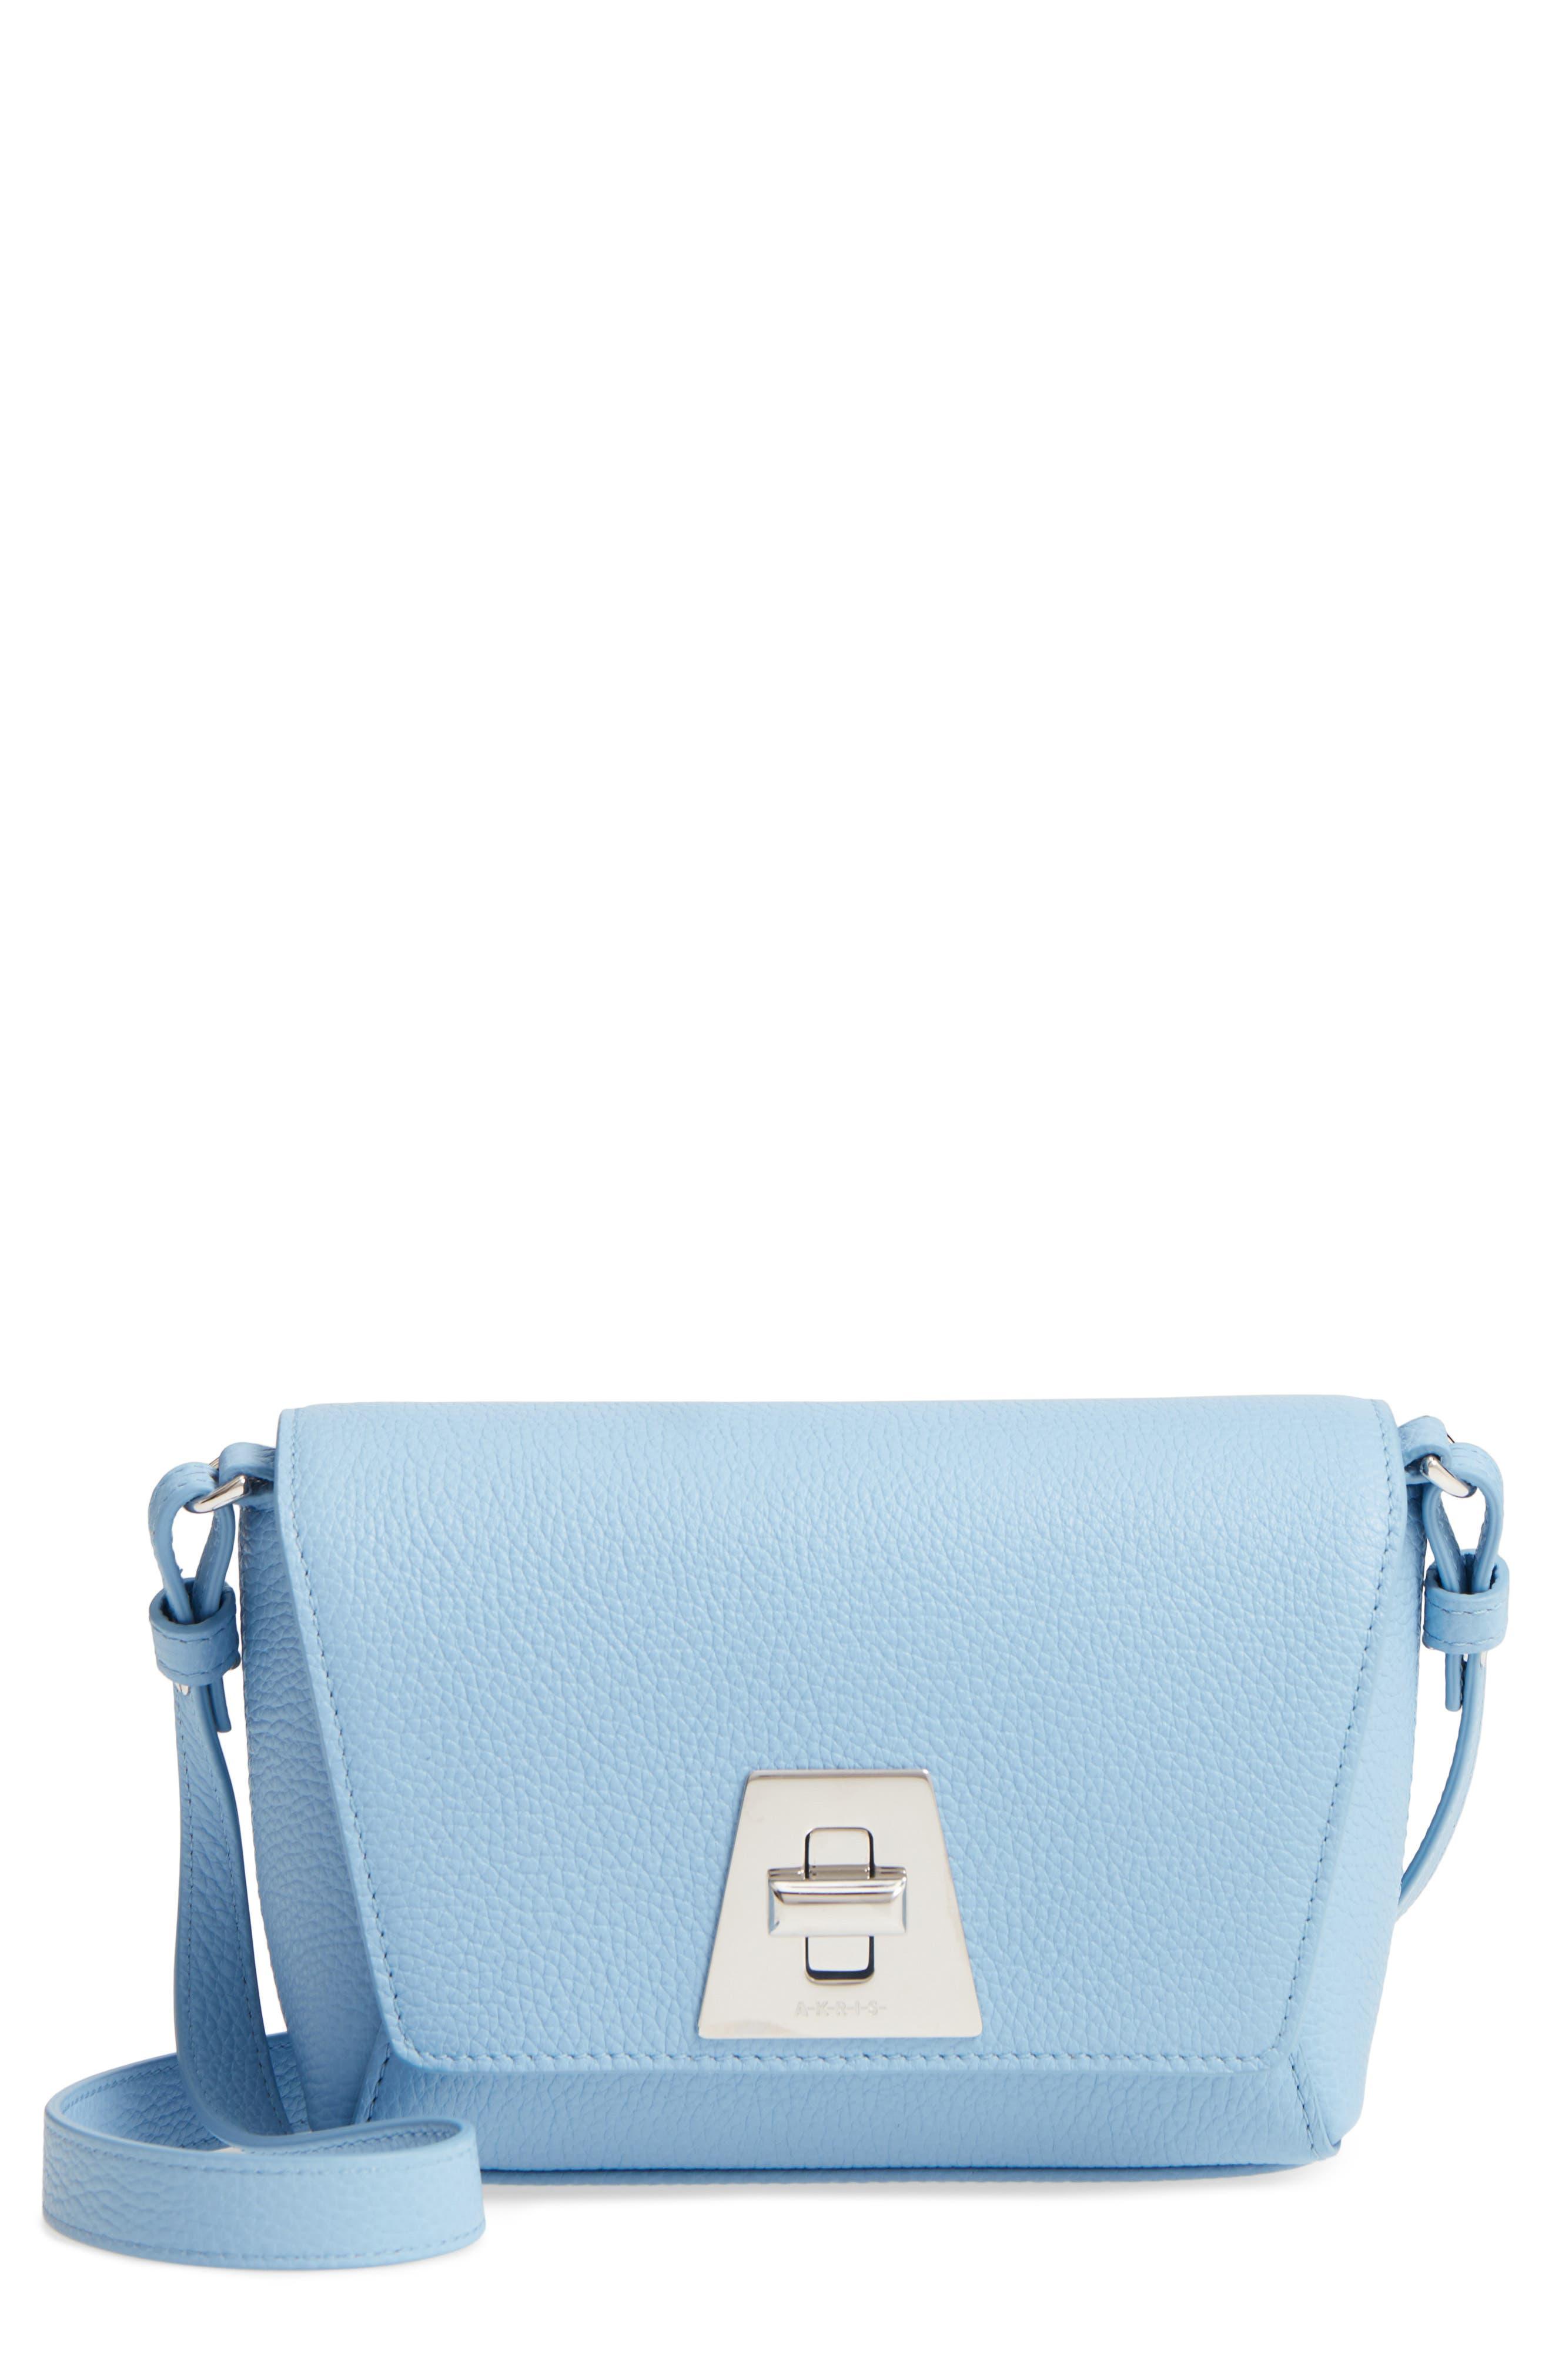 Little Anouk Calfskin Crossbody Bag,                             Main thumbnail 1, color,                             POWDER BLUE